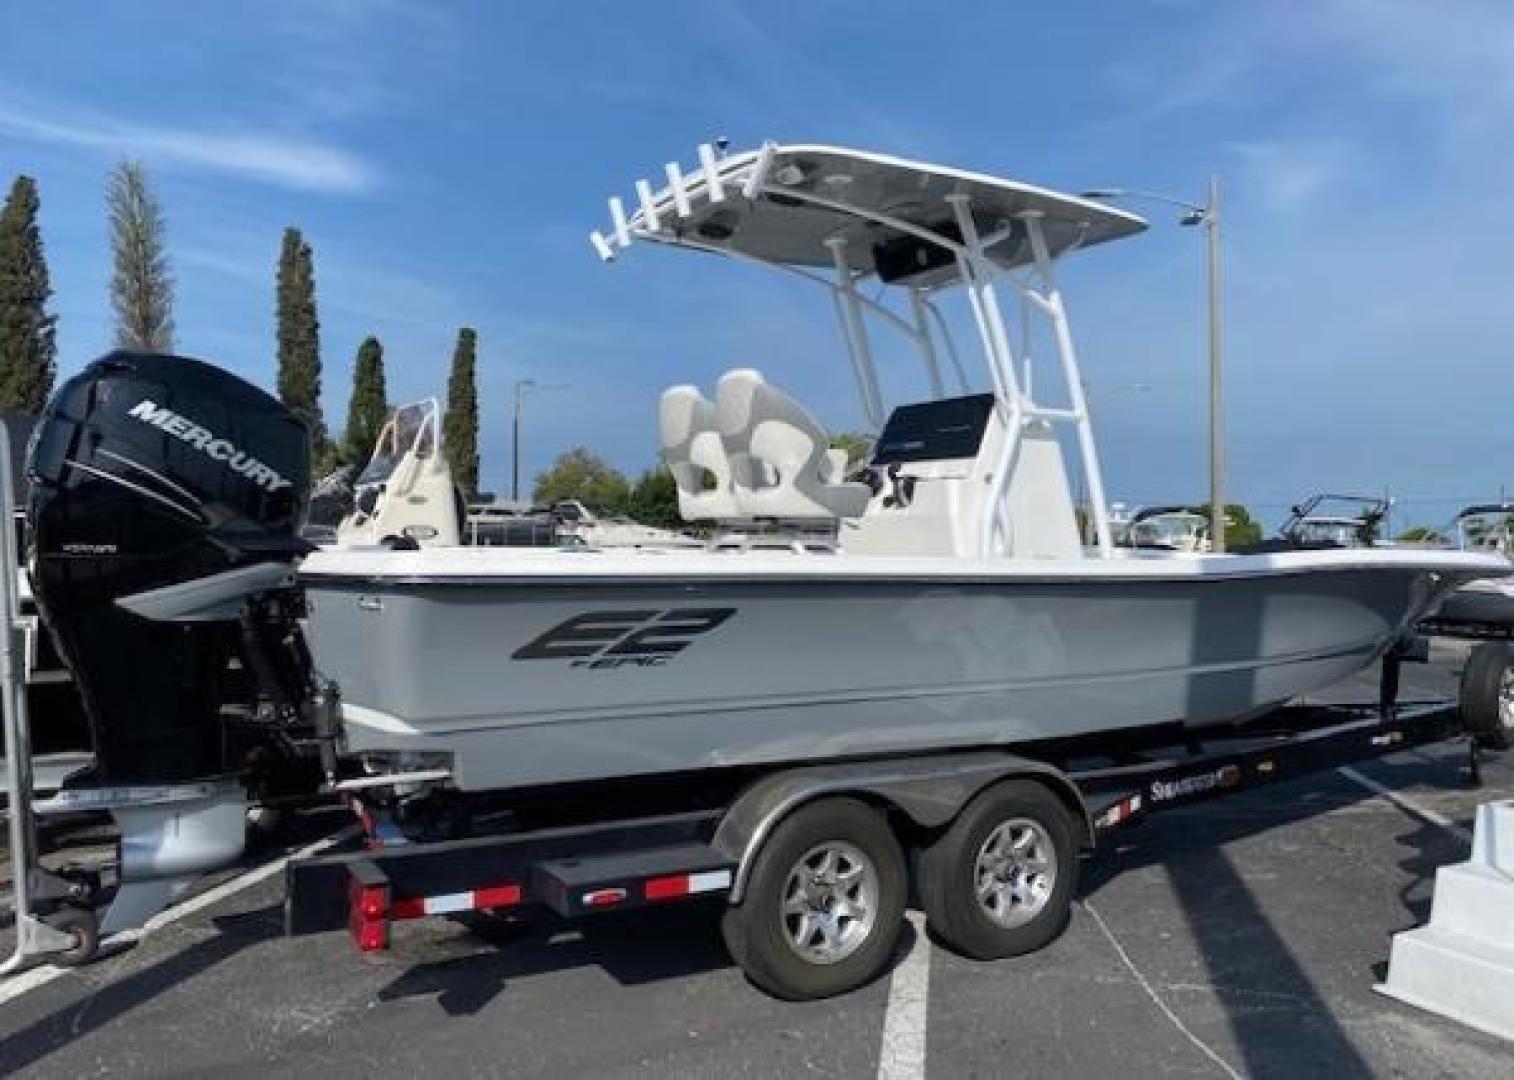 Epic-26 Bay 2019-Epic 26 Bay Tampa Bay-Florida-United States-1526356 | Thumbnail